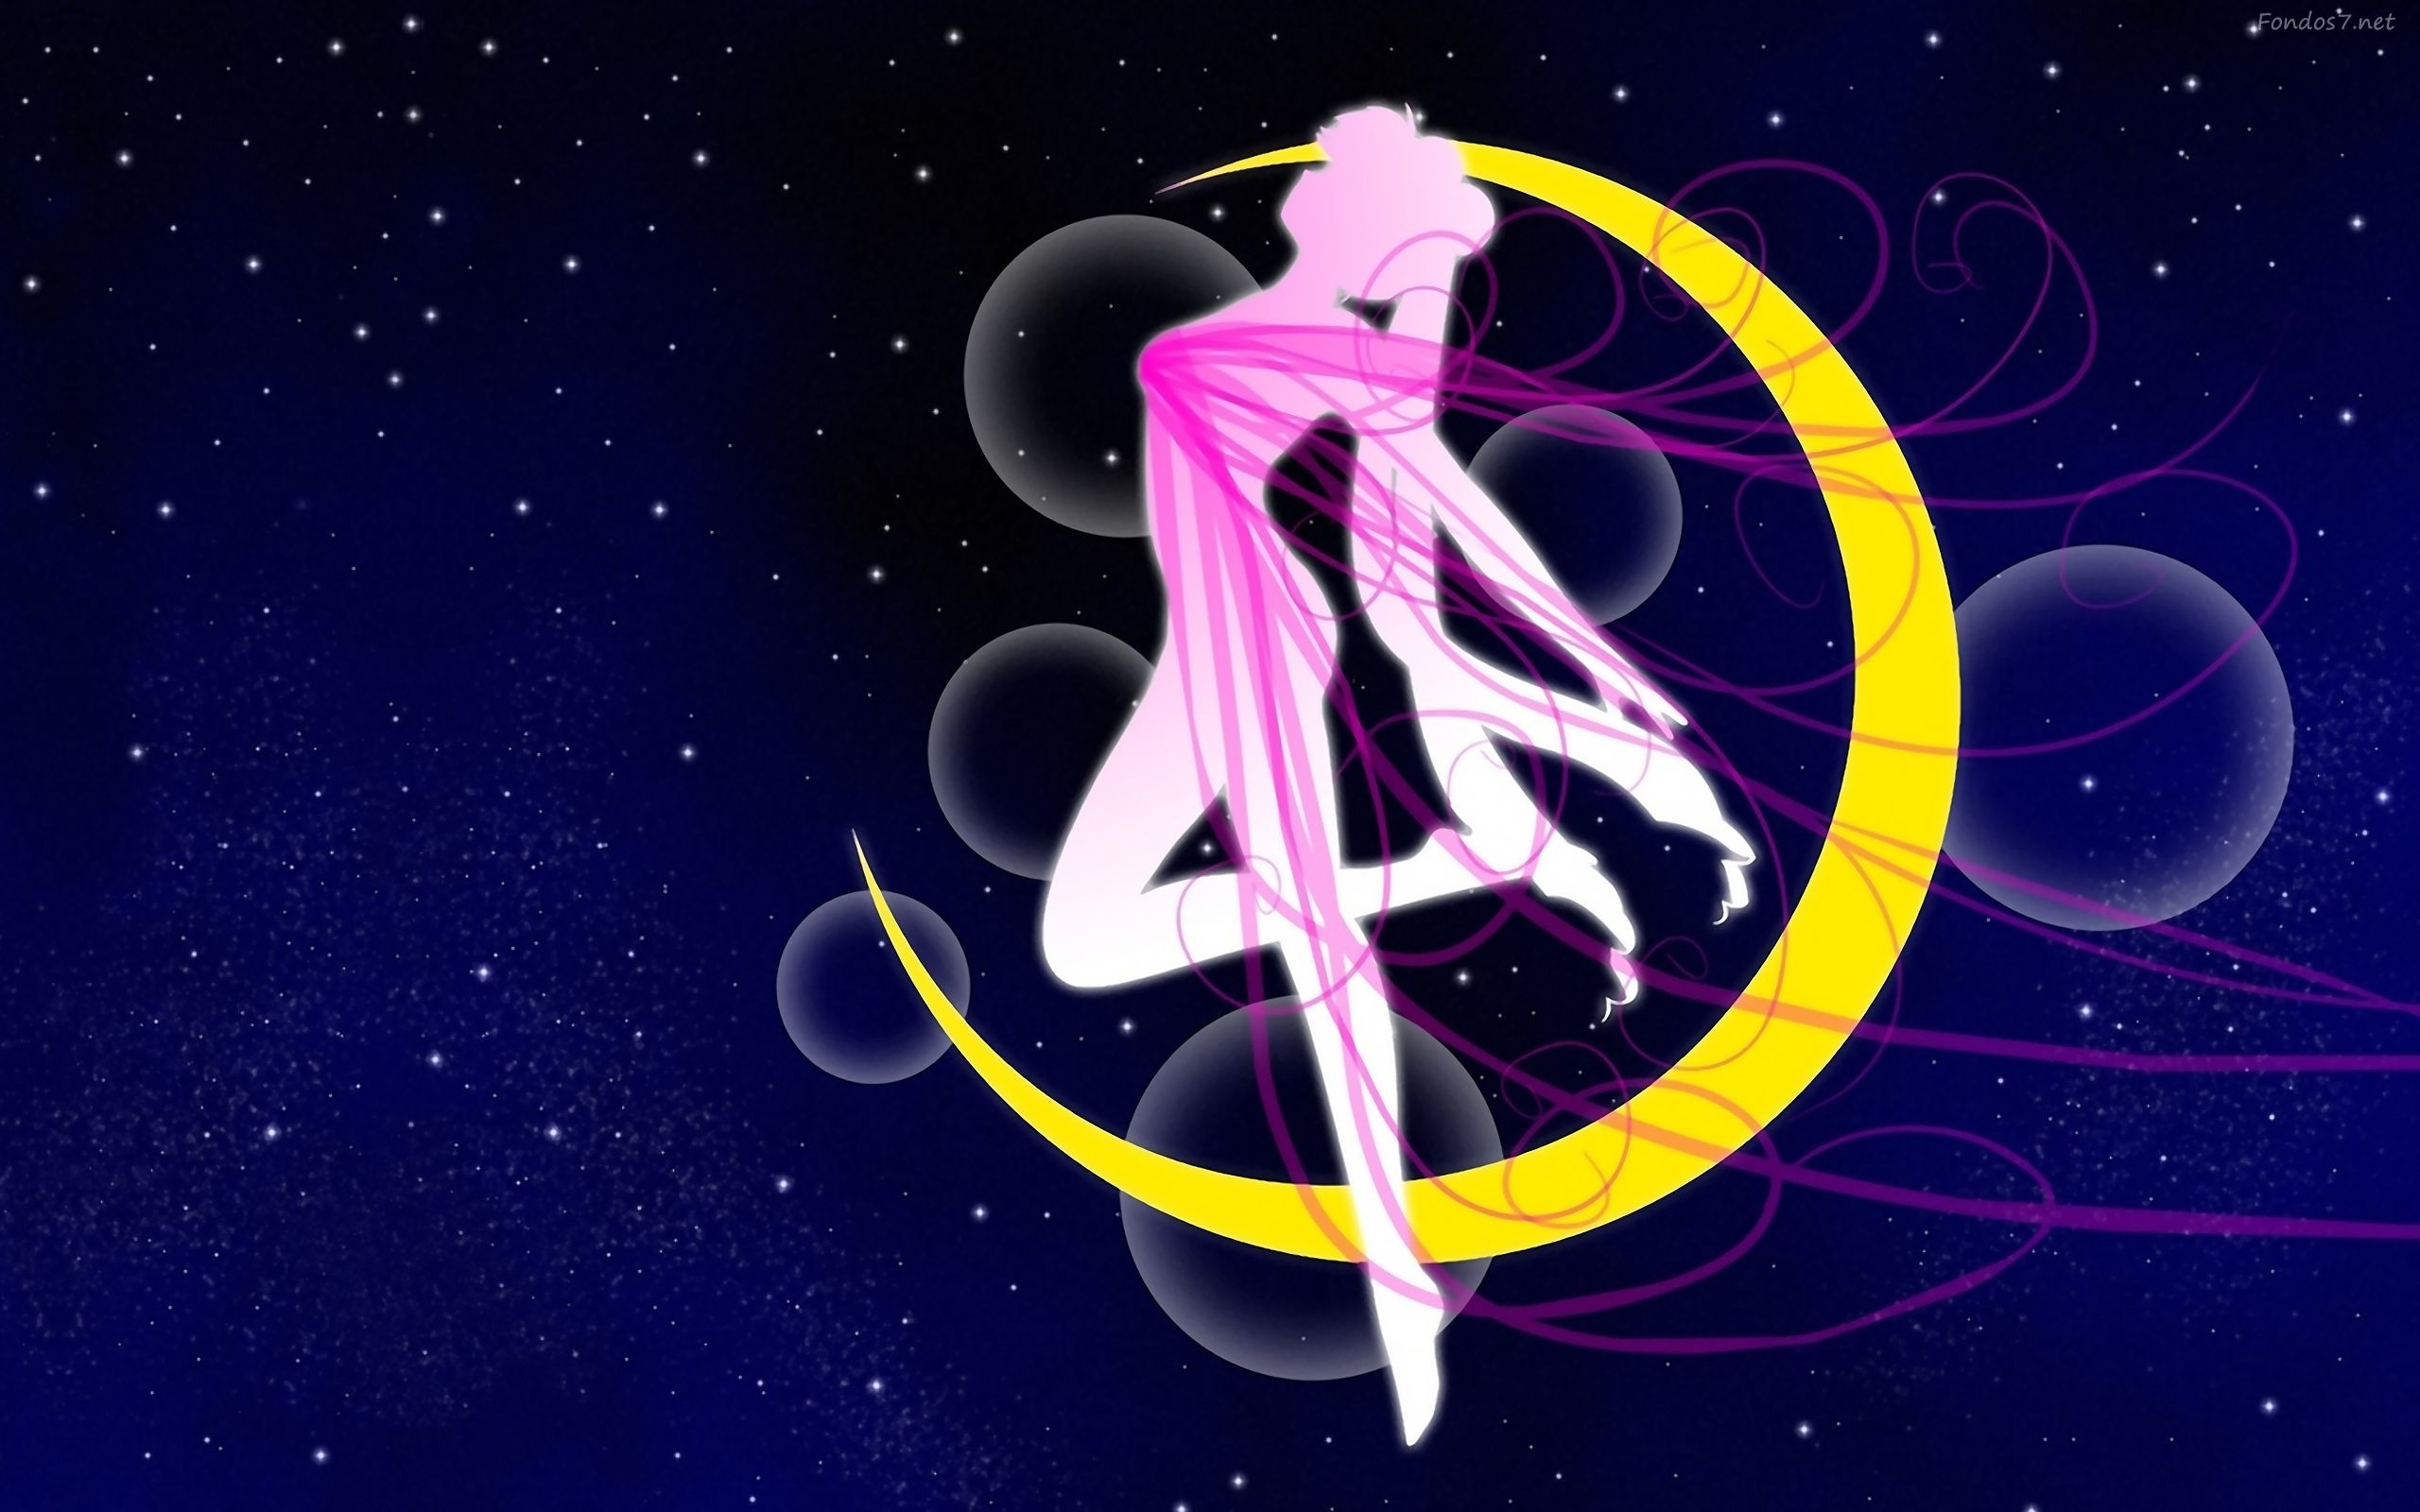 1786x2500 Tags Anime Bishoujo Senshi Sailor Moon 2002 Calendar Kino Makoto